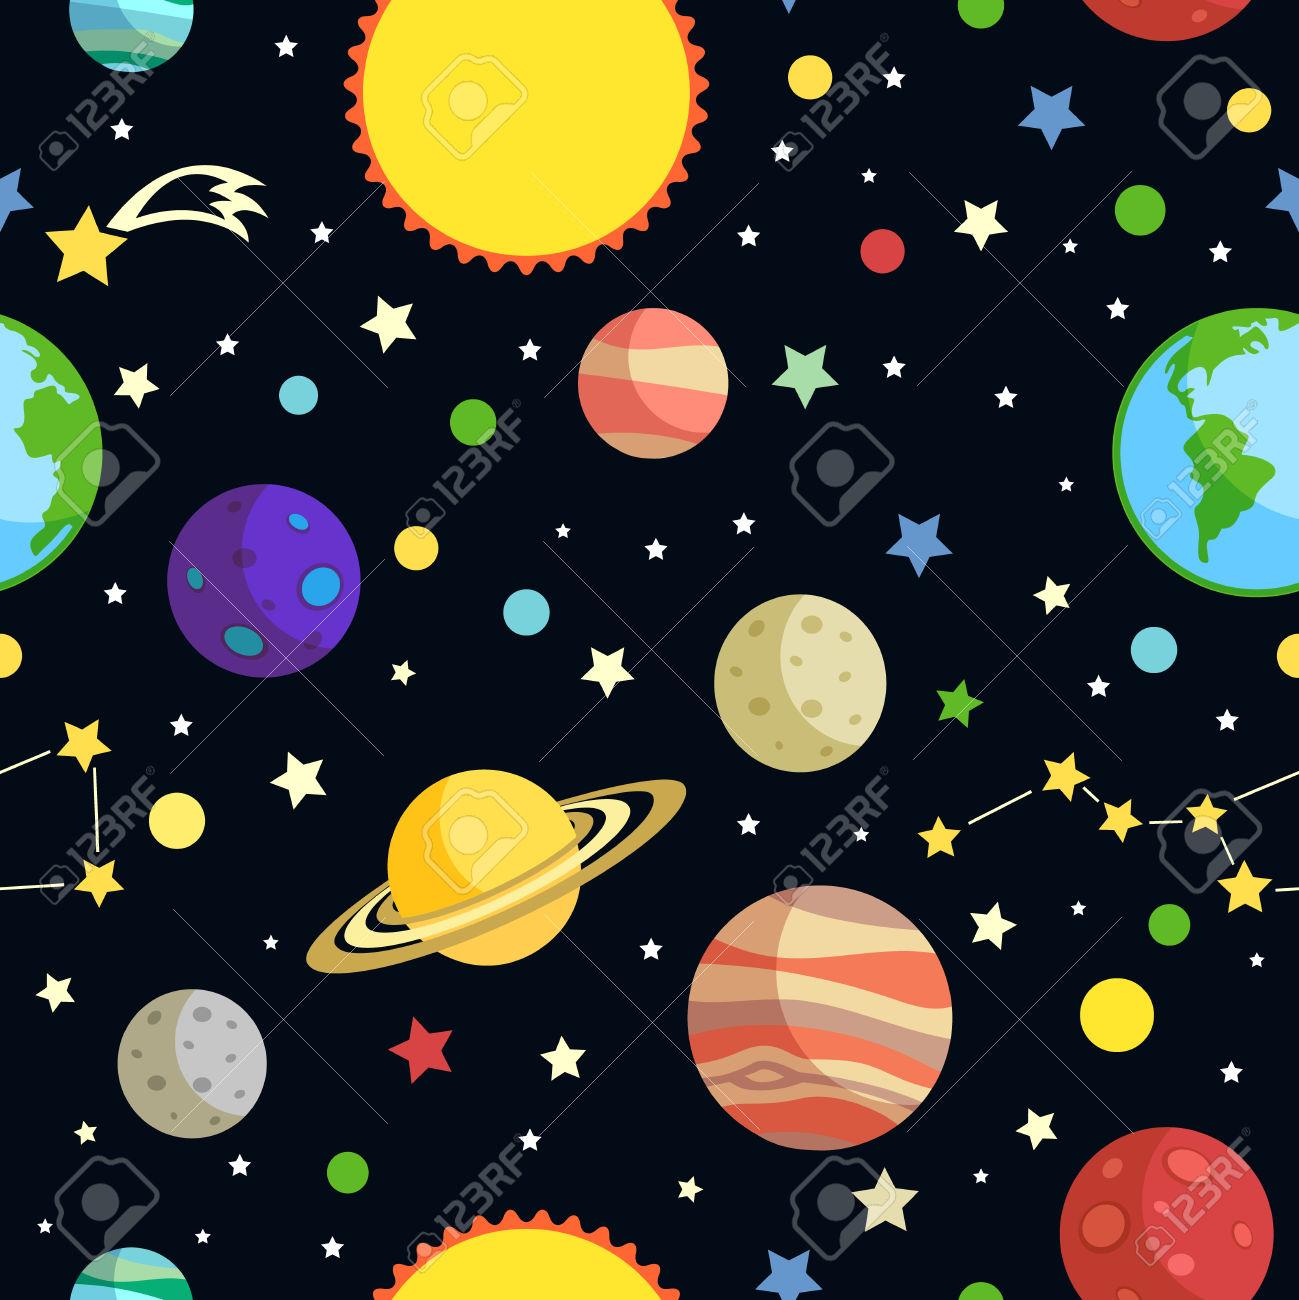 Galaxy clipart illustration. Stock illustrations vectors clip